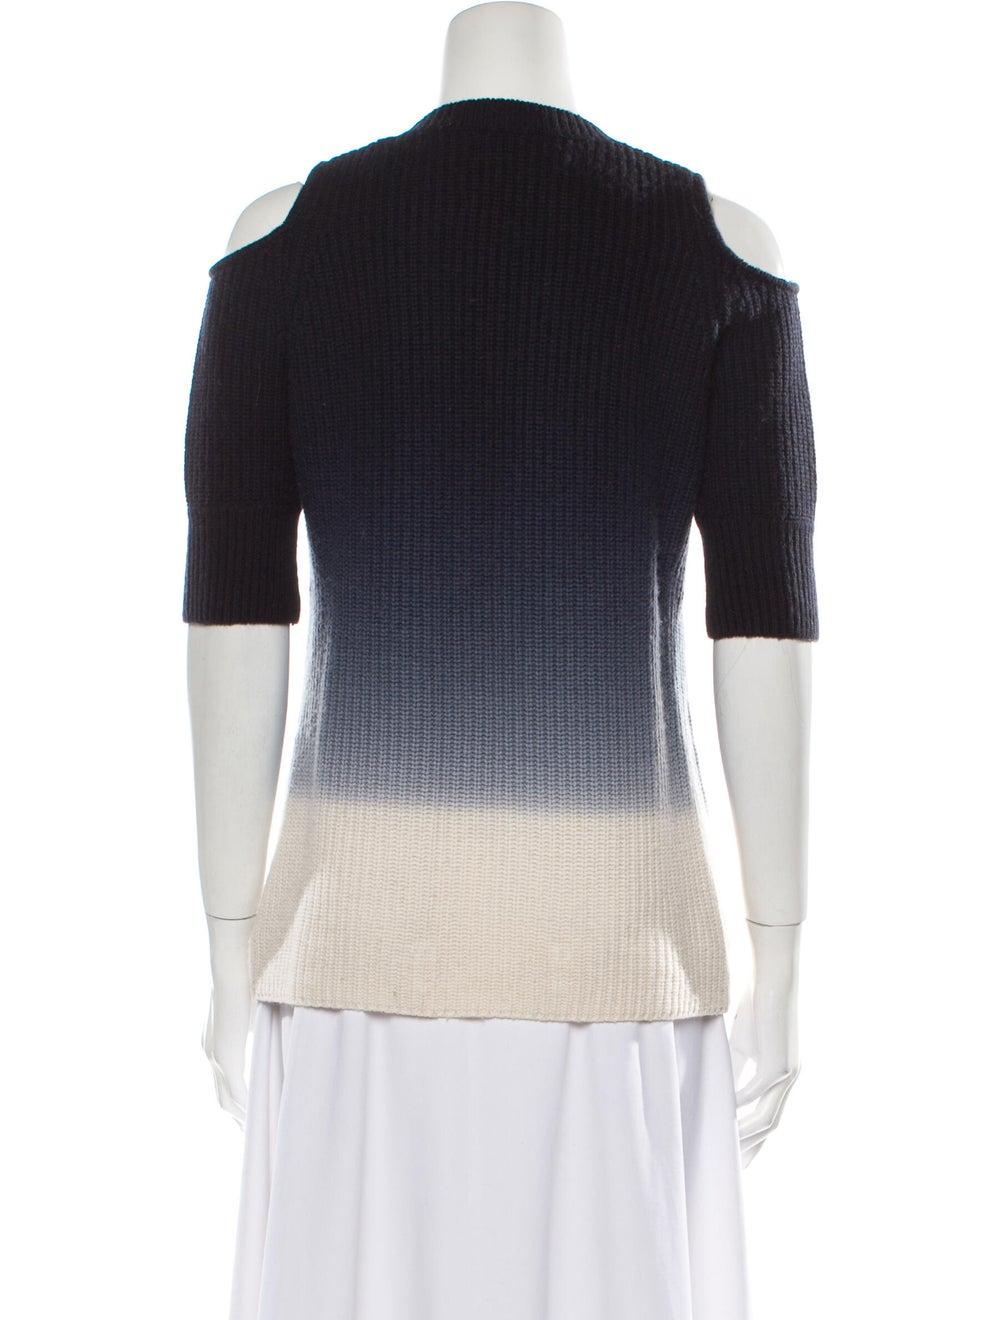 Zoë Jordan Wool Tie-Dye Print Sweater Wool - image 3